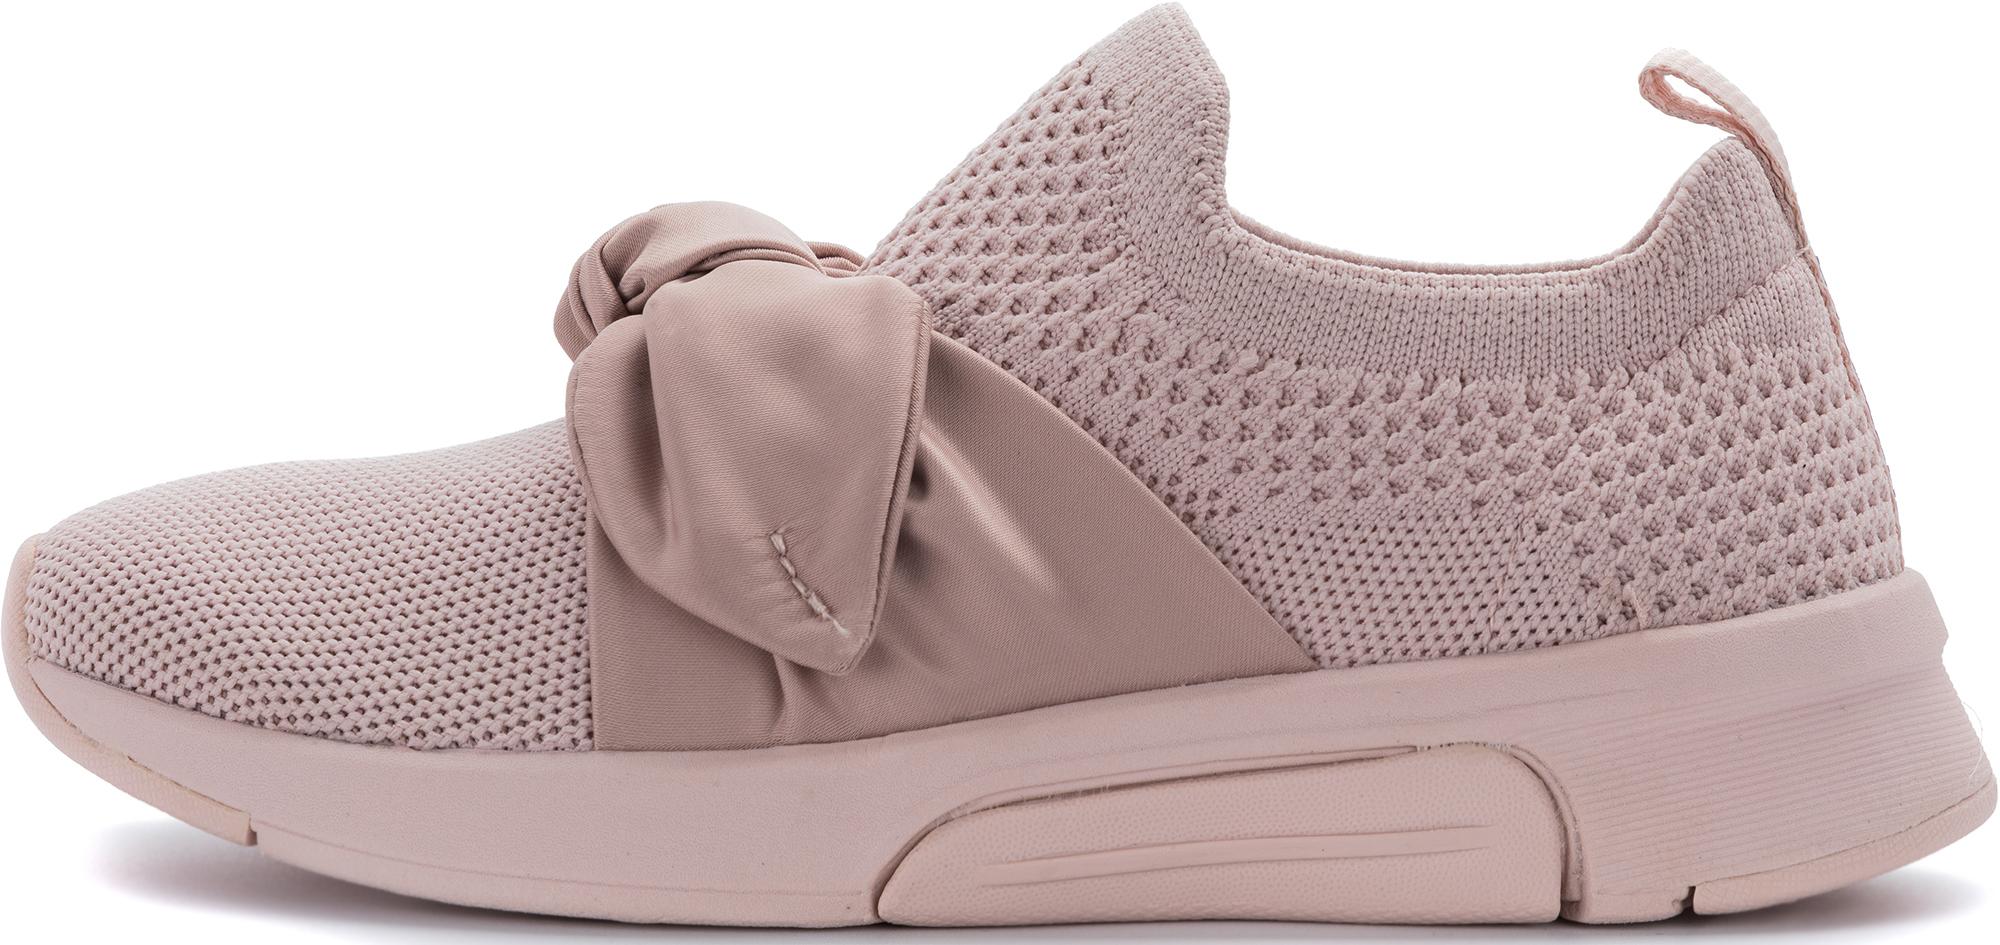 Skechers Кроссовки для девочек Modern Jogger-Debbie, размер 34